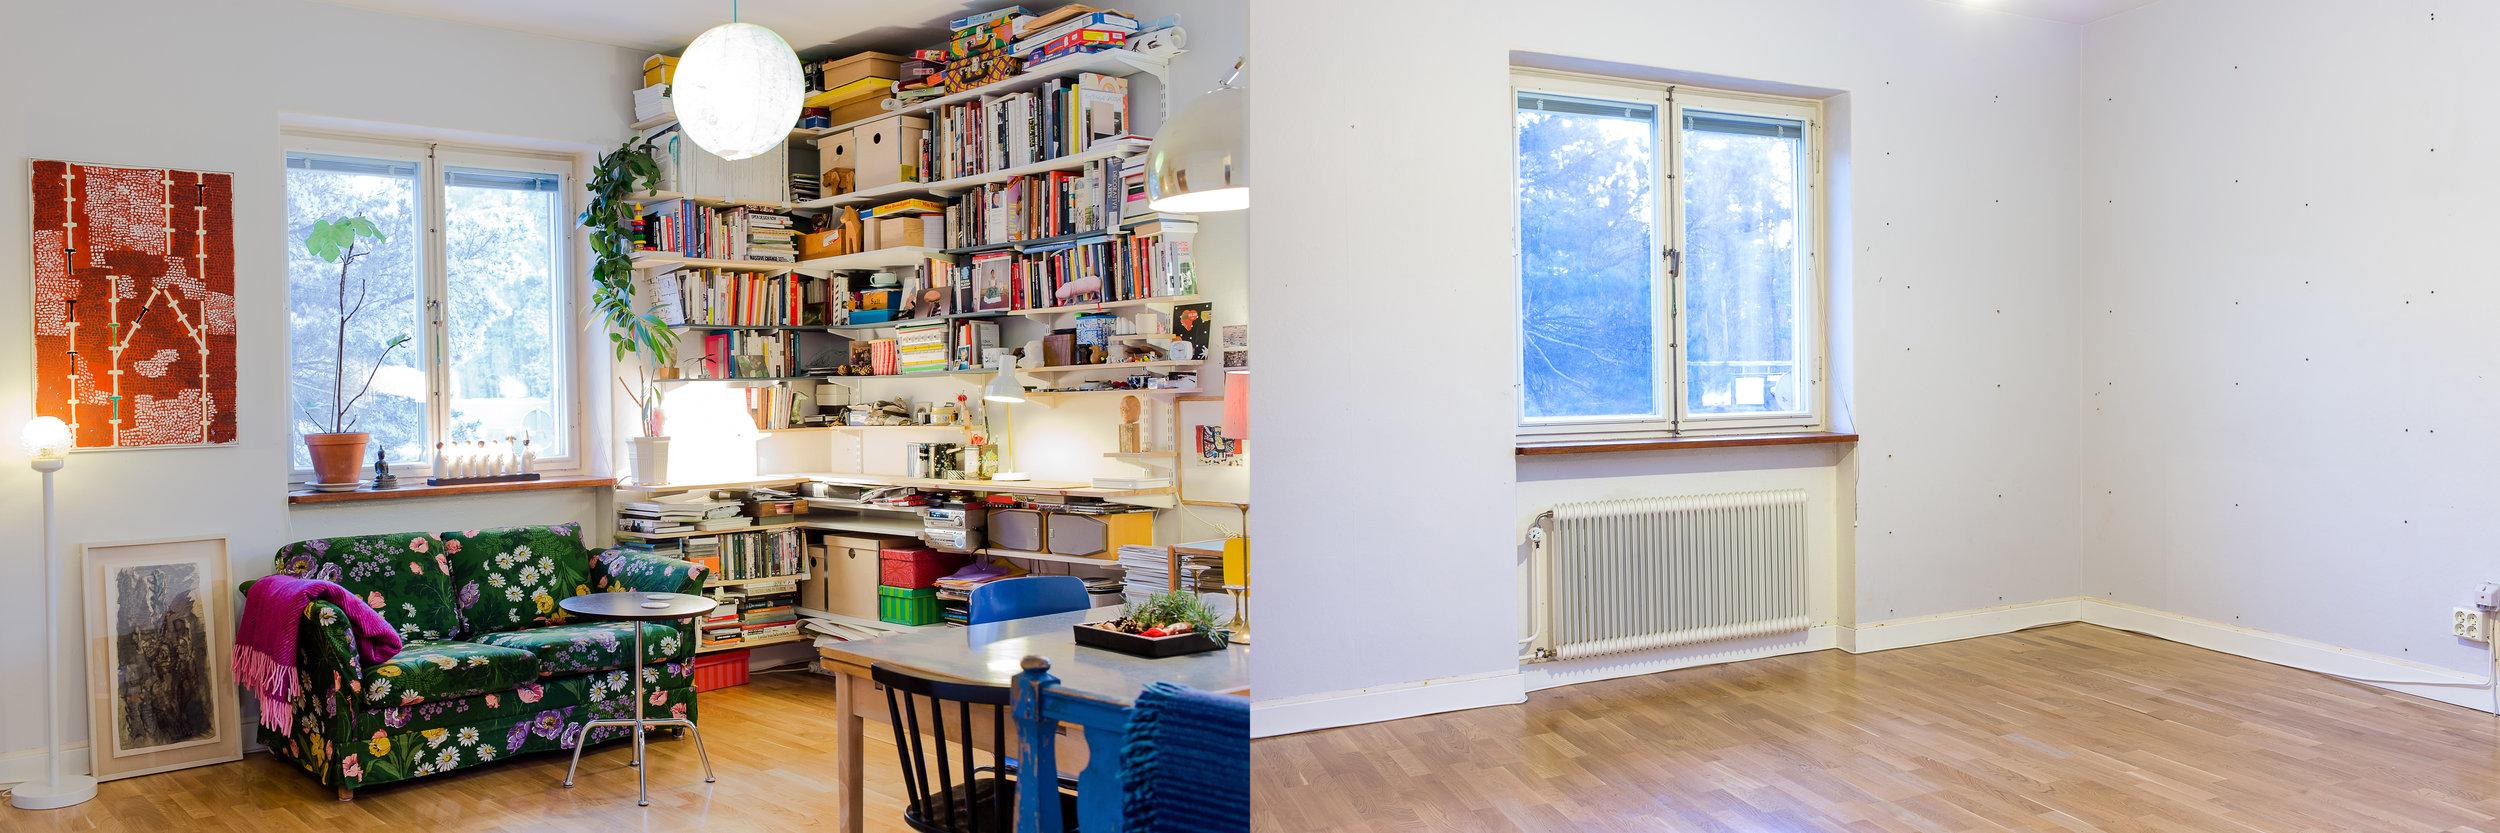 kristina_schultz_100days_livingroom_double.jpg